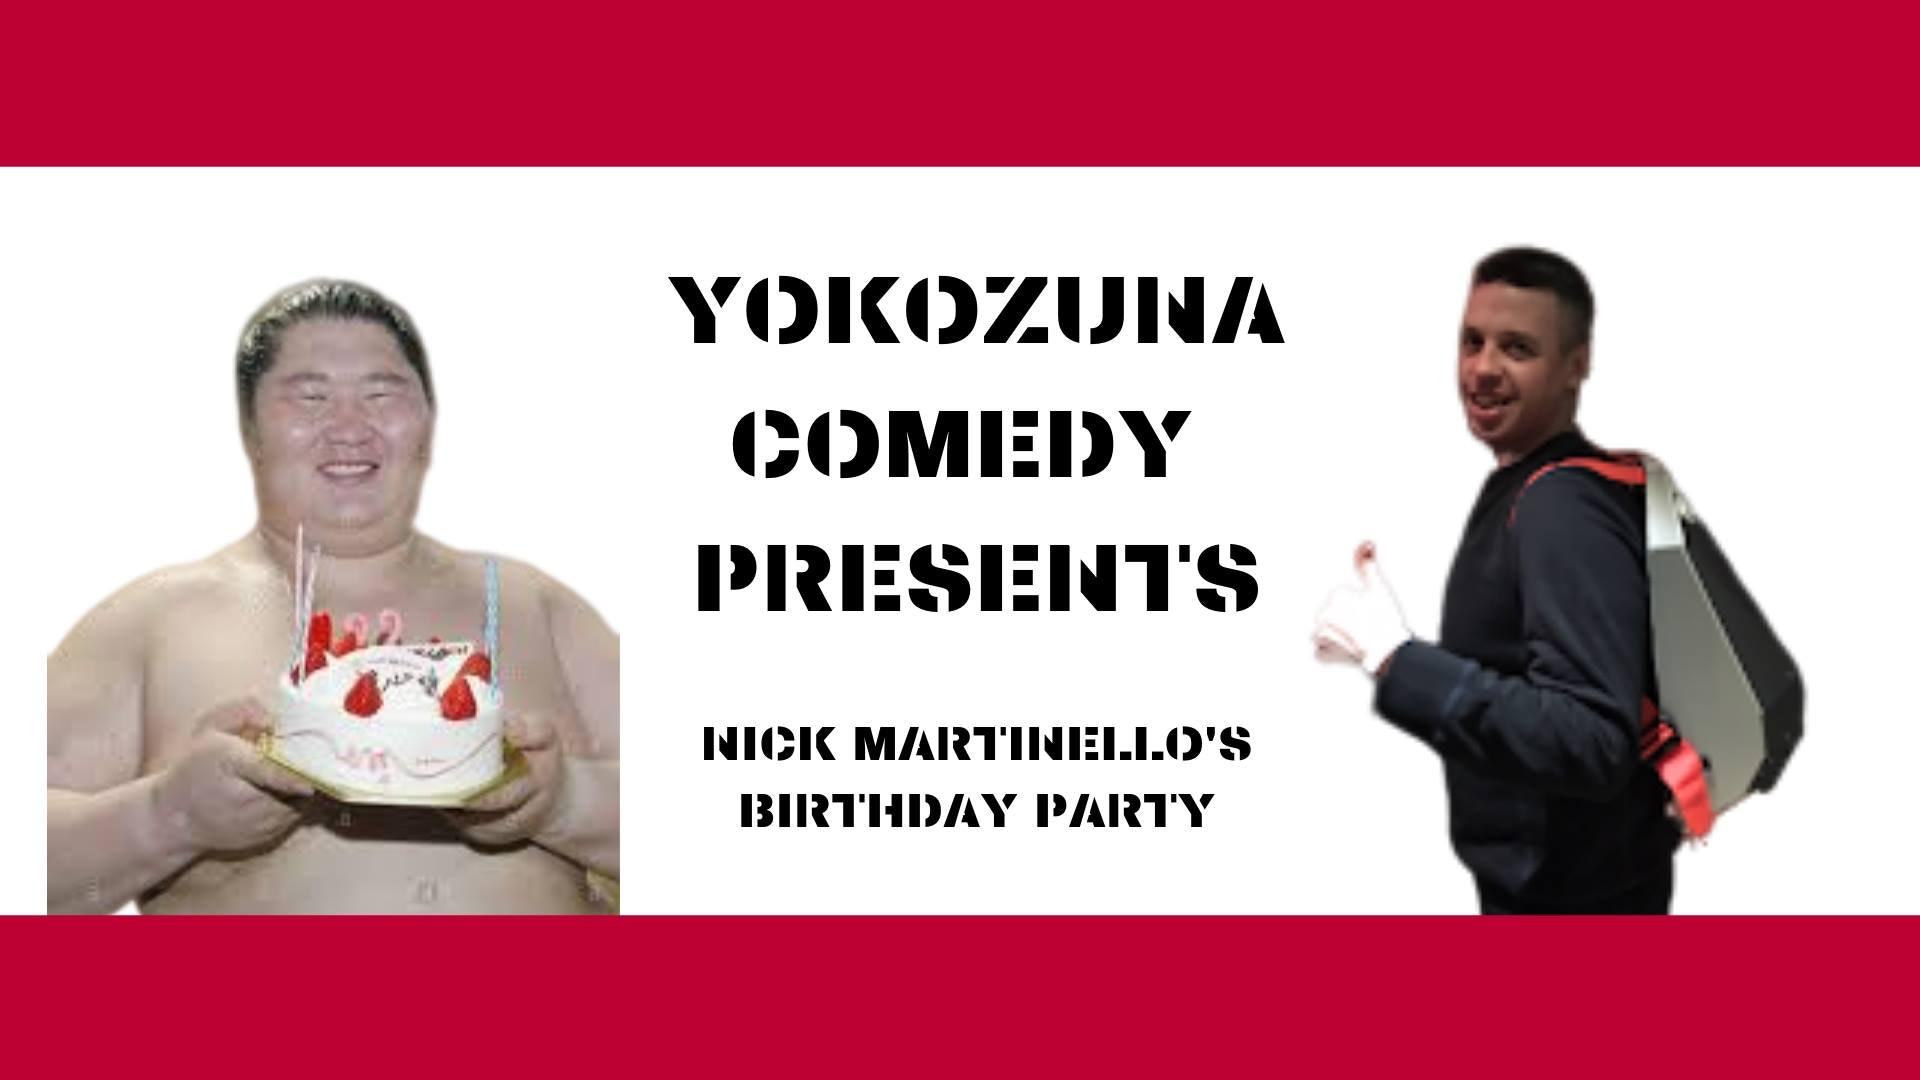 Yokozuna Comedy Presents: Nick Martinello's Birthday Party